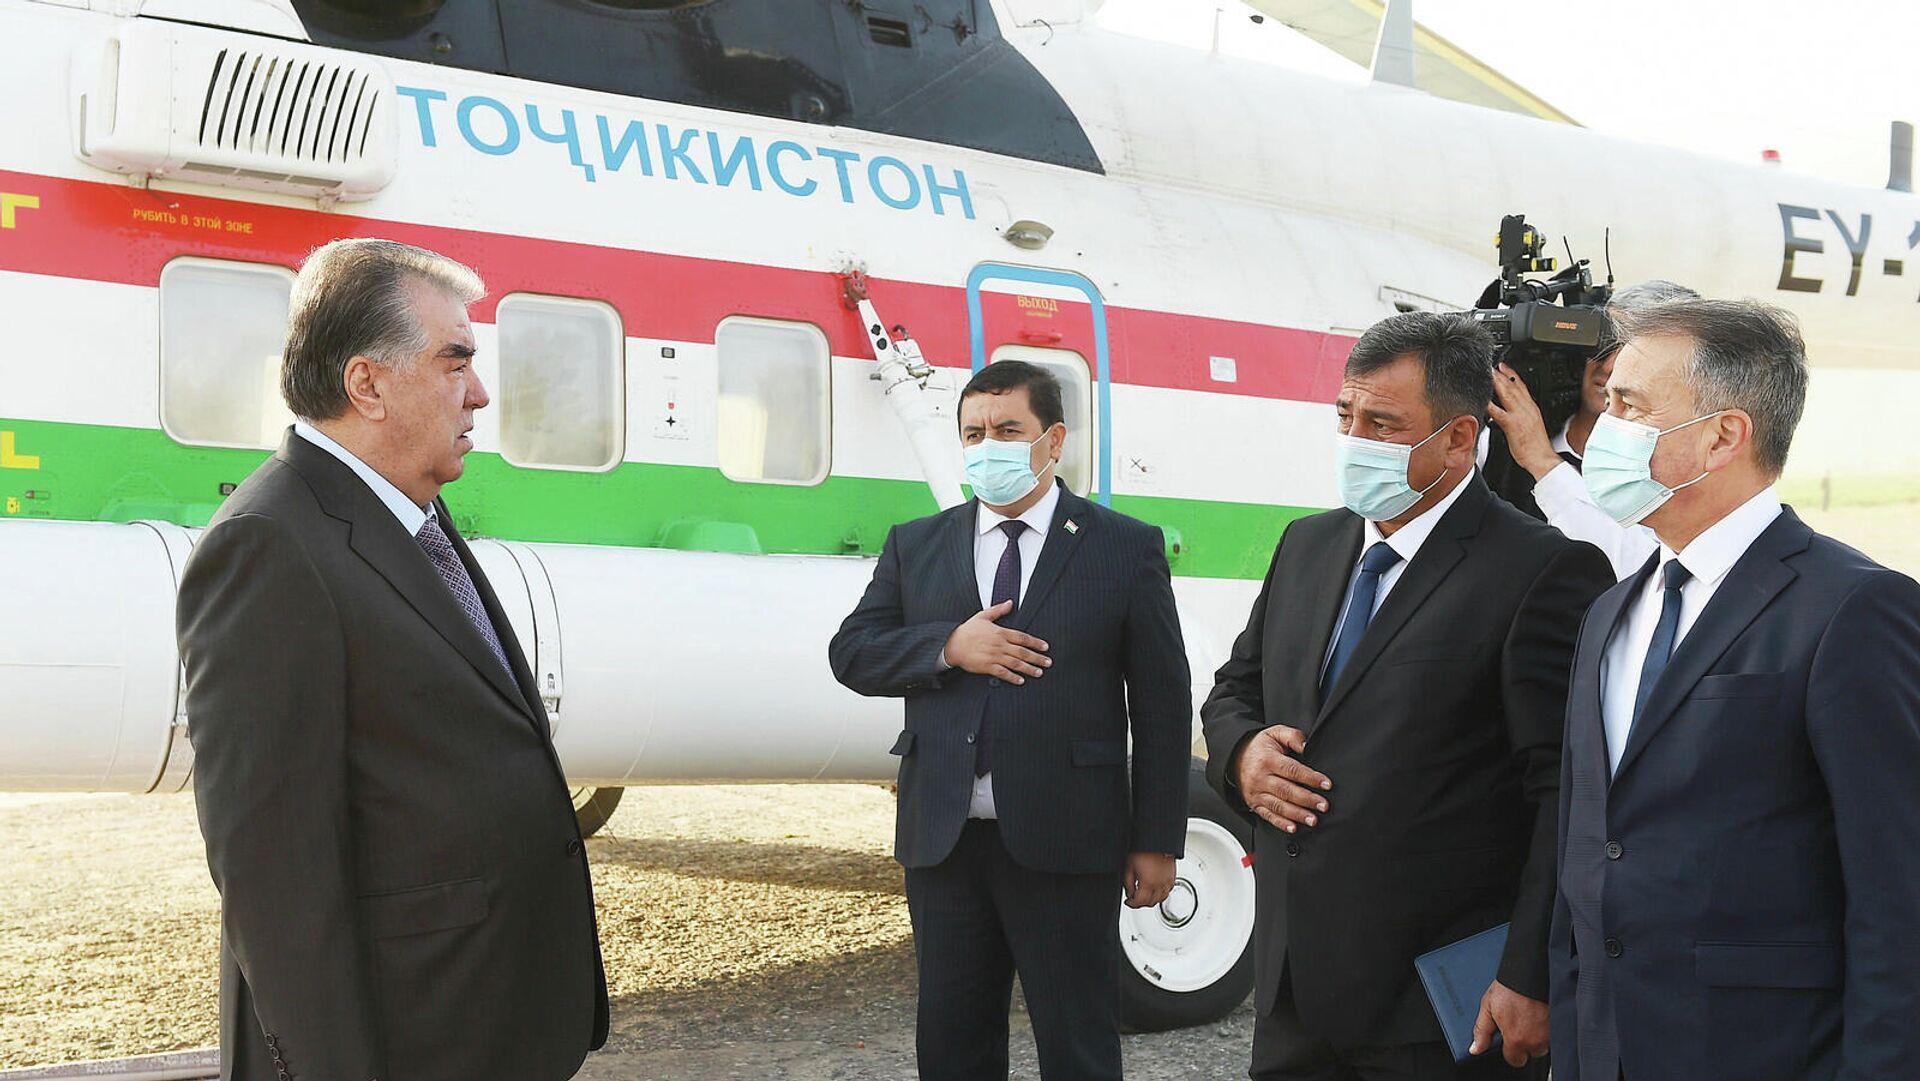 Рабочий визит Эмомали Рахмона в Лахшский район  - Sputnik Таджикистан, 1920, 21.09.2021